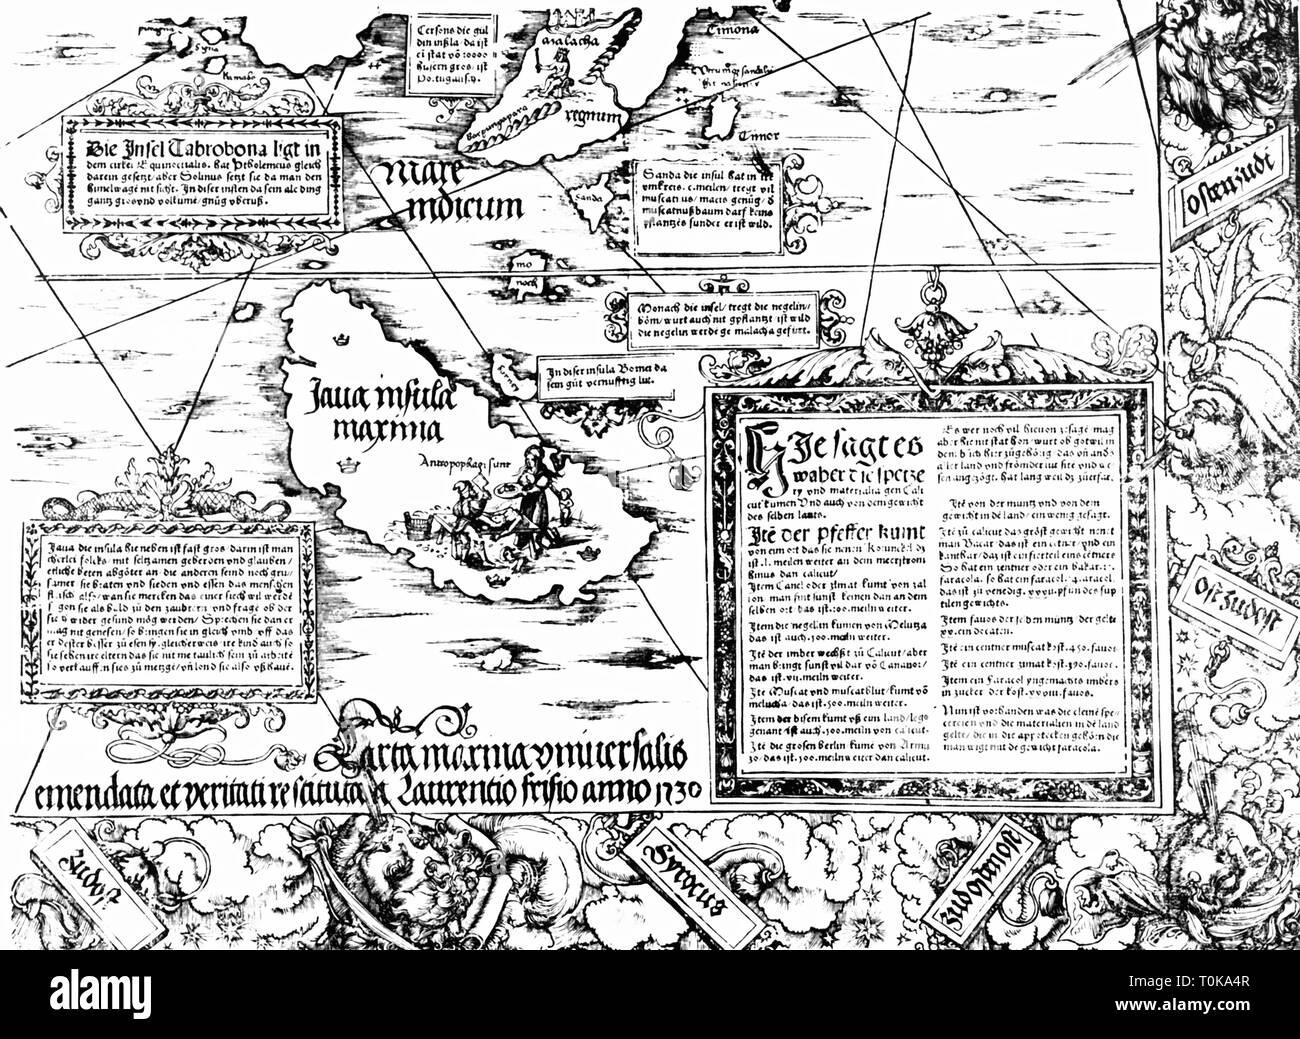 La cartographie, les cartes, l'île de Java, Carta Marina Navigatoria Portugallensis', détail, woodcut, Allemagne, 1525, Additional-Rights Clearance-Info-Not-Available- Photo Stock